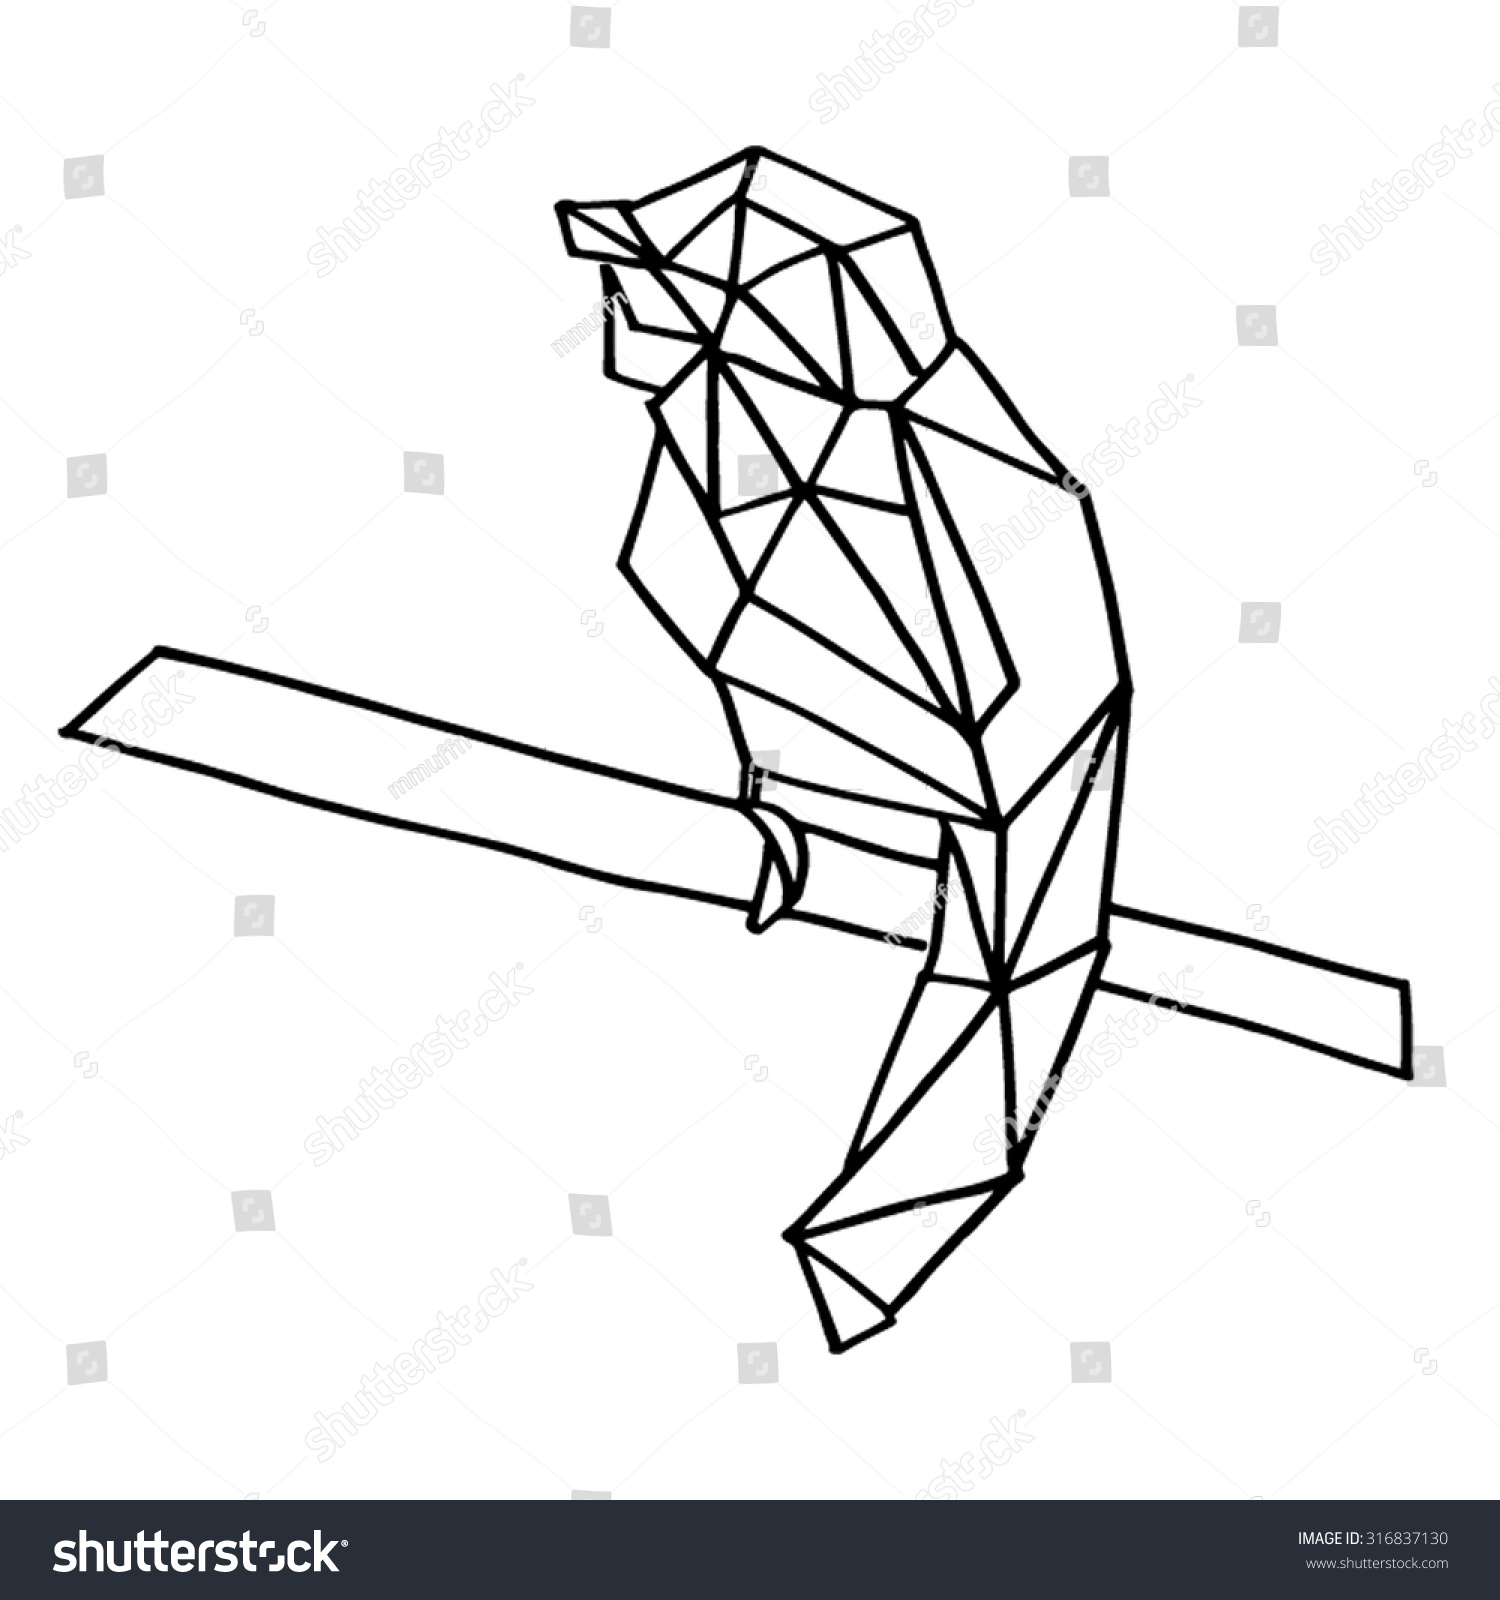 bird geometric animal life nature shape stock vector (royalty free